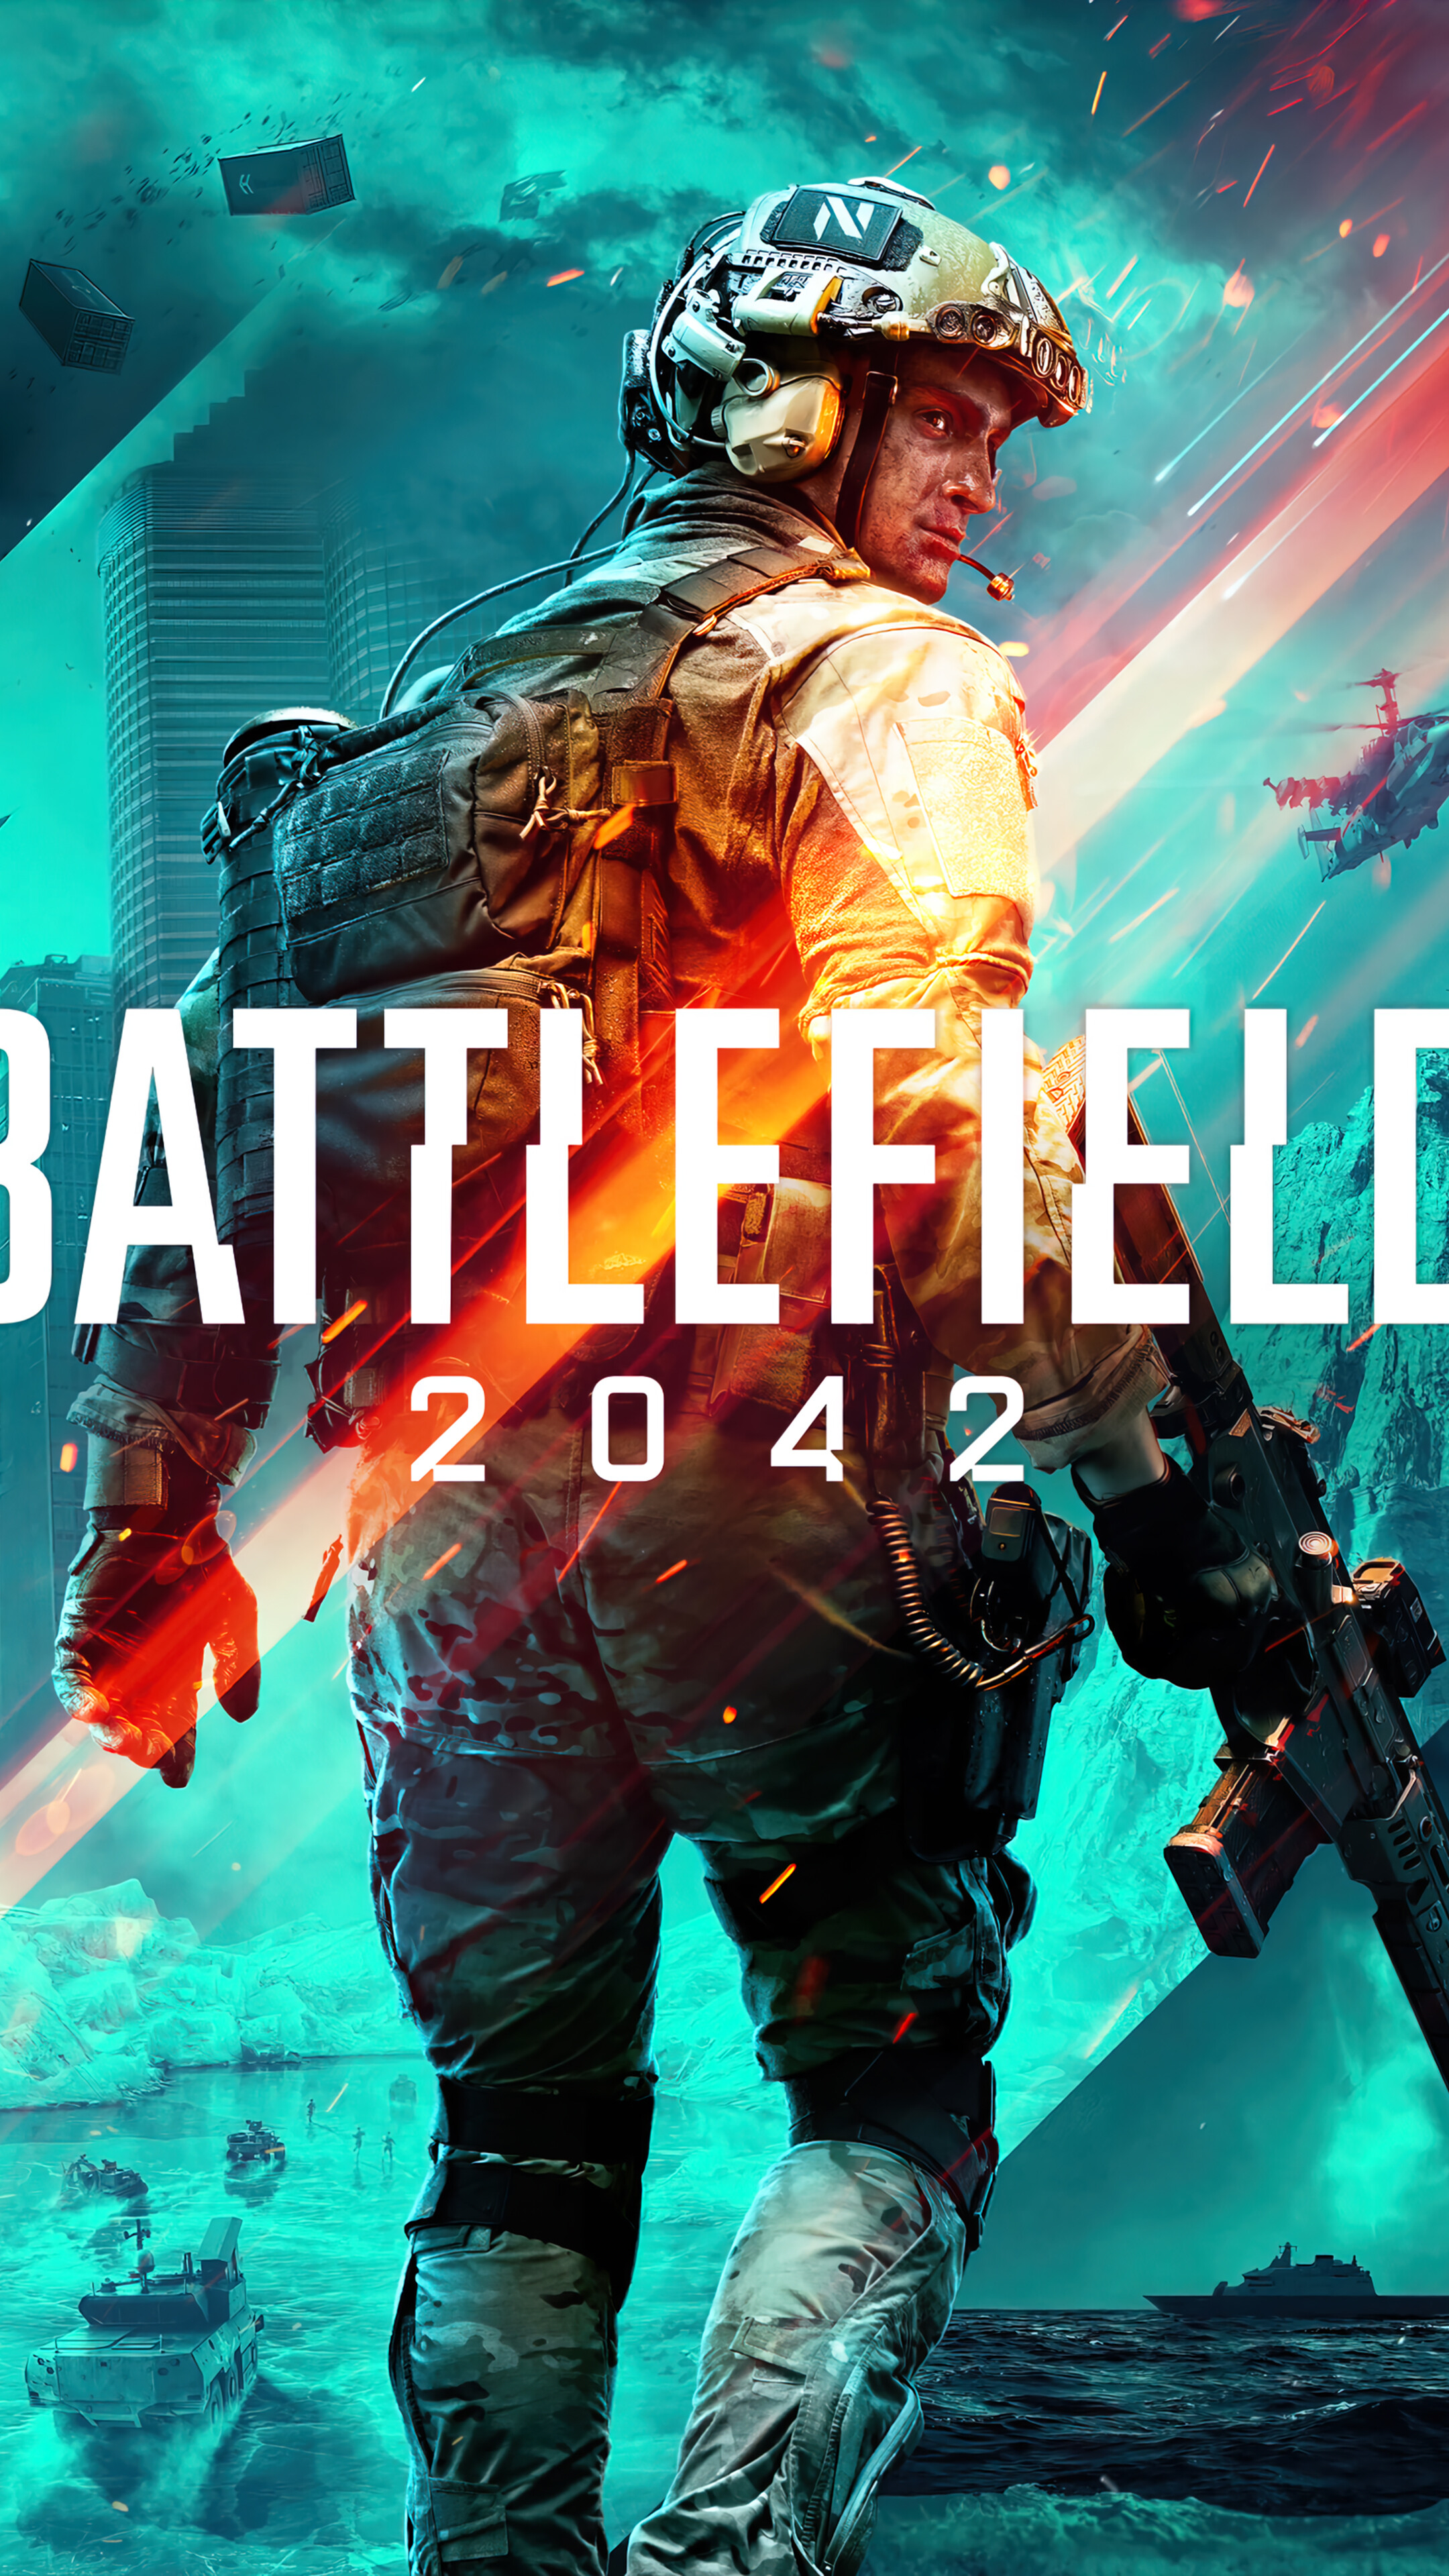 Battlefield 2042 Wallpaper 4K PC Desktop 4611a 2160x3840